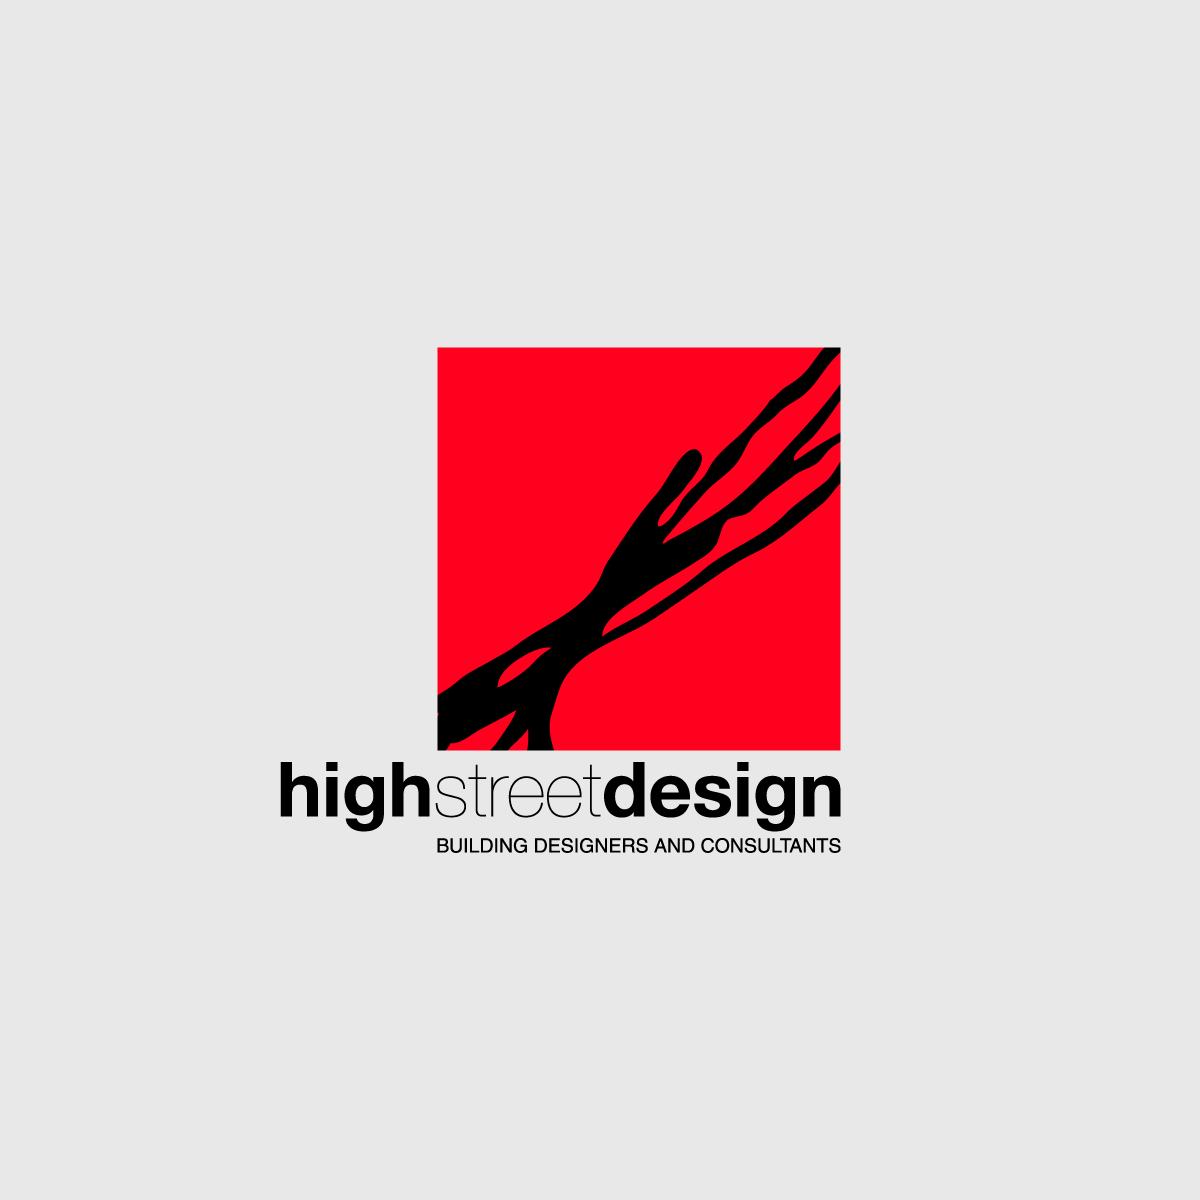 high-street-design.png